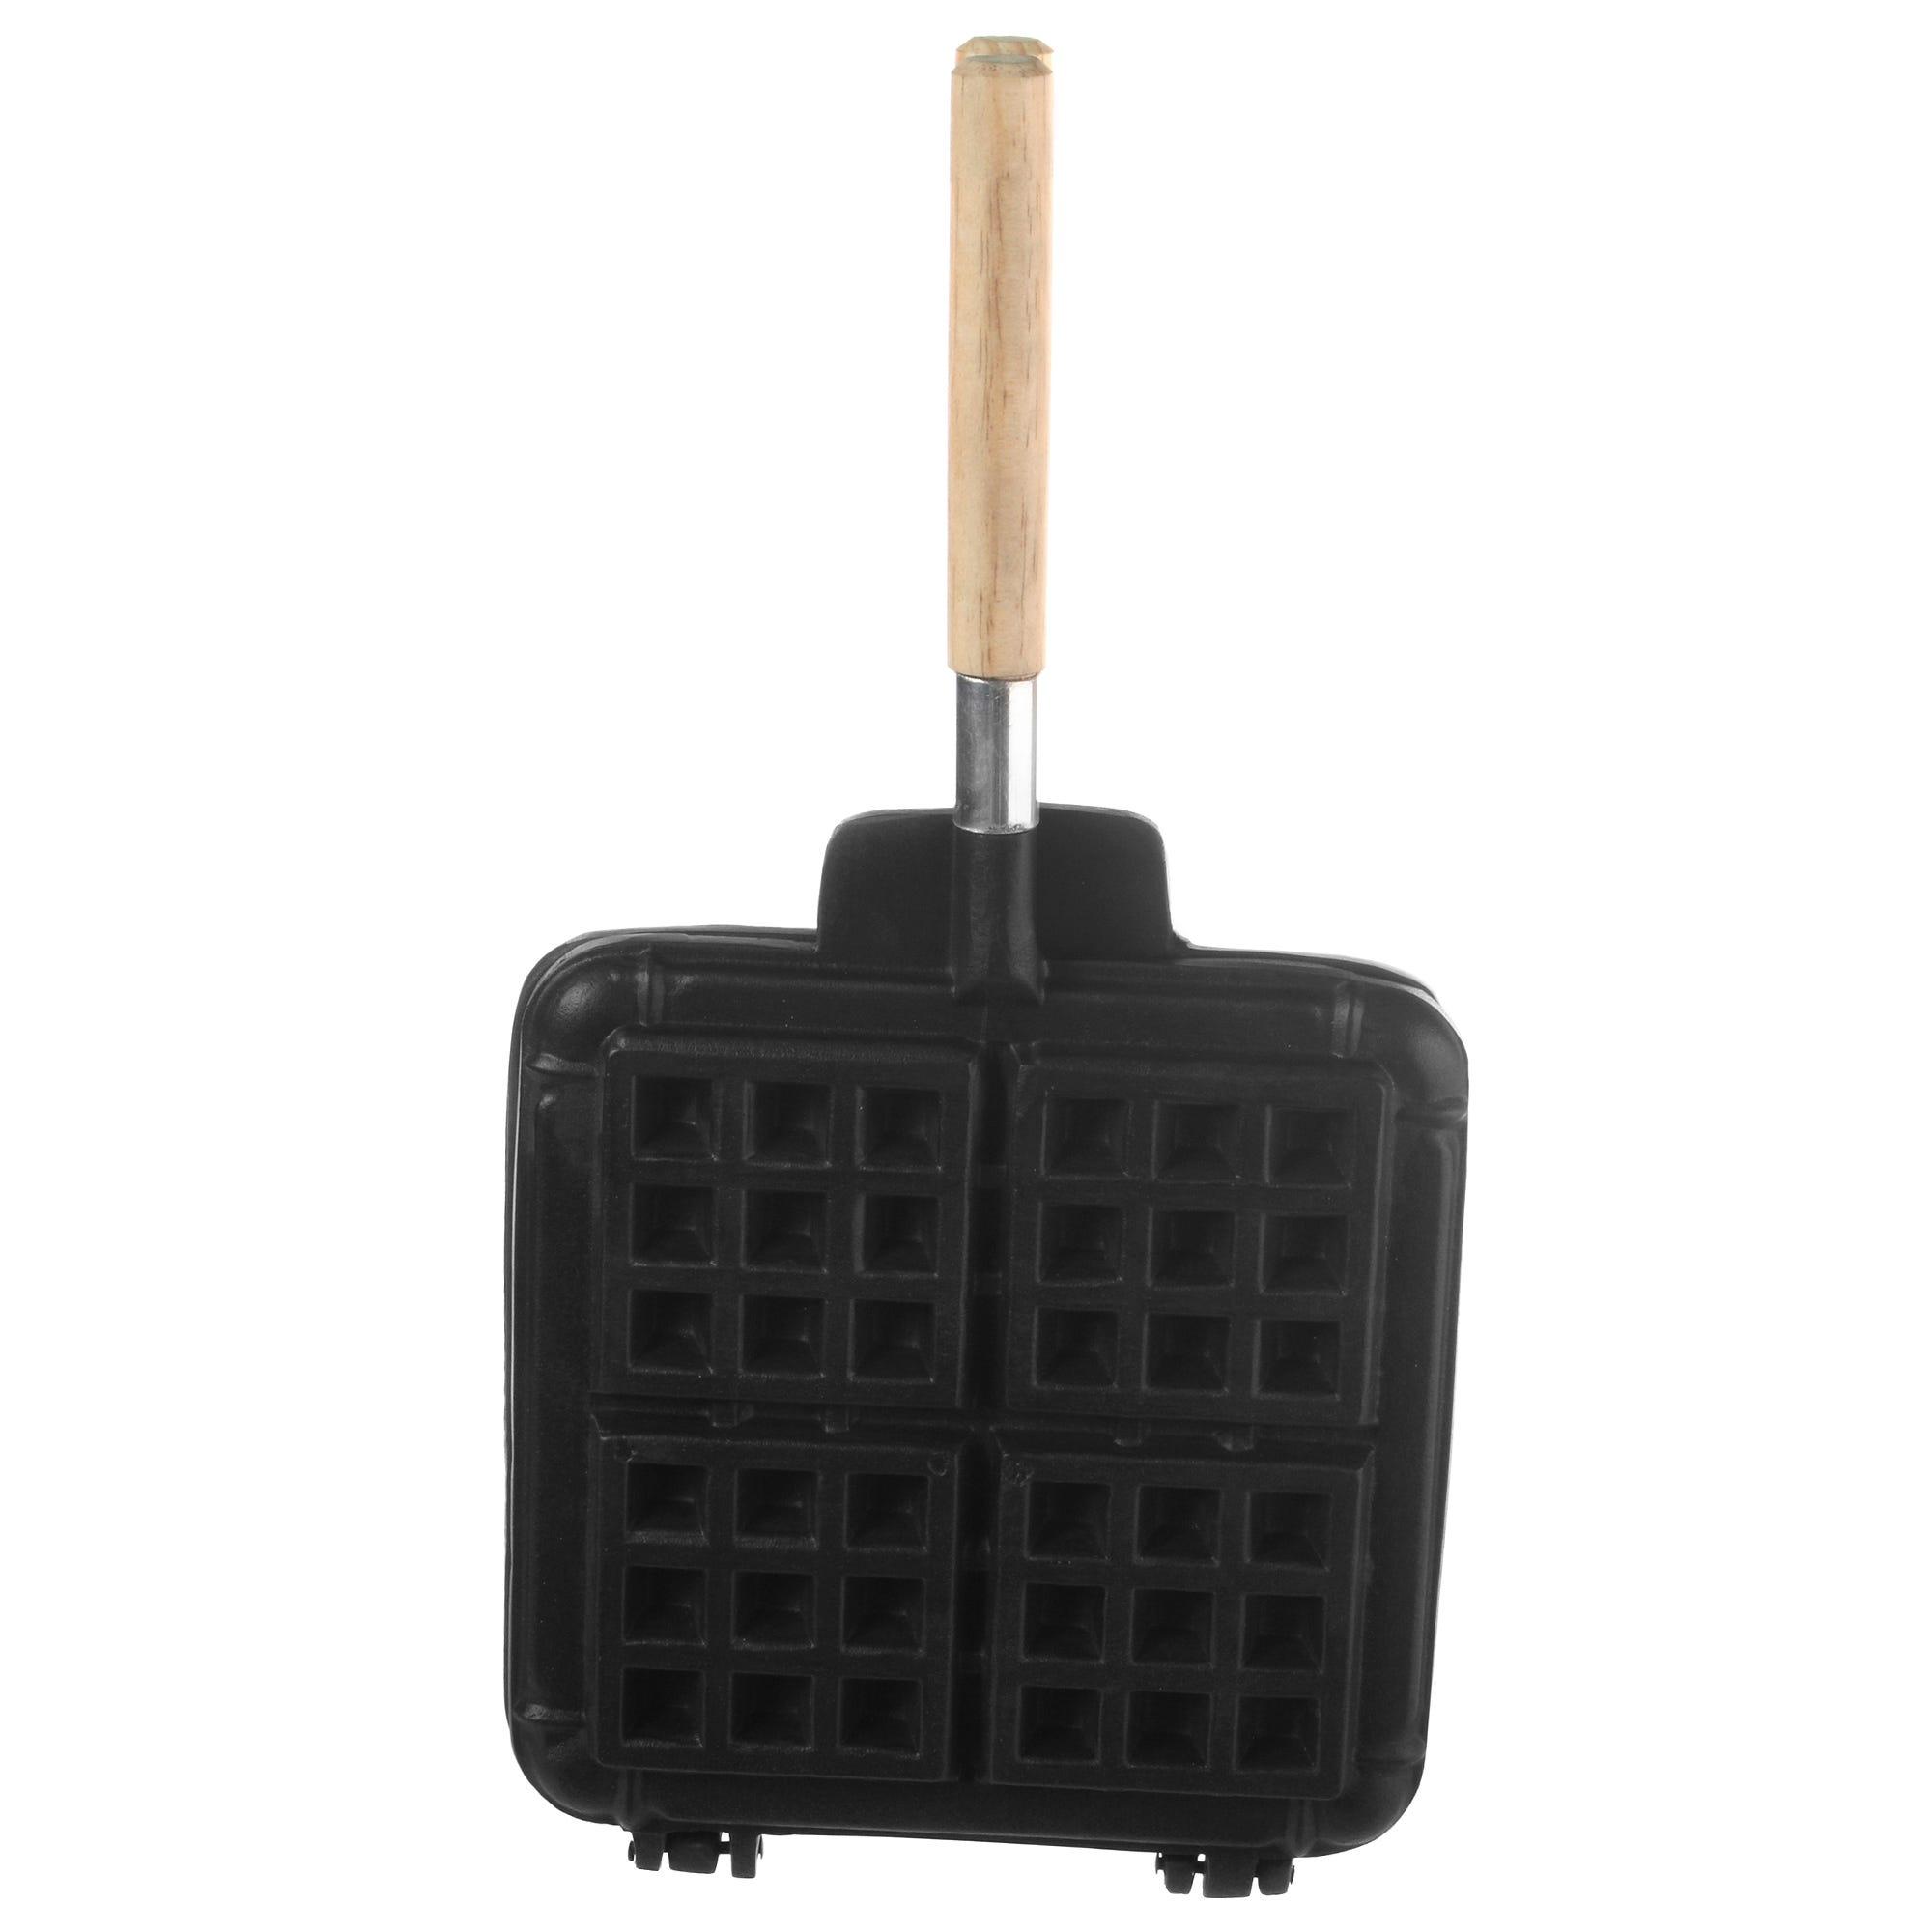 Waflera Cocinart en negro